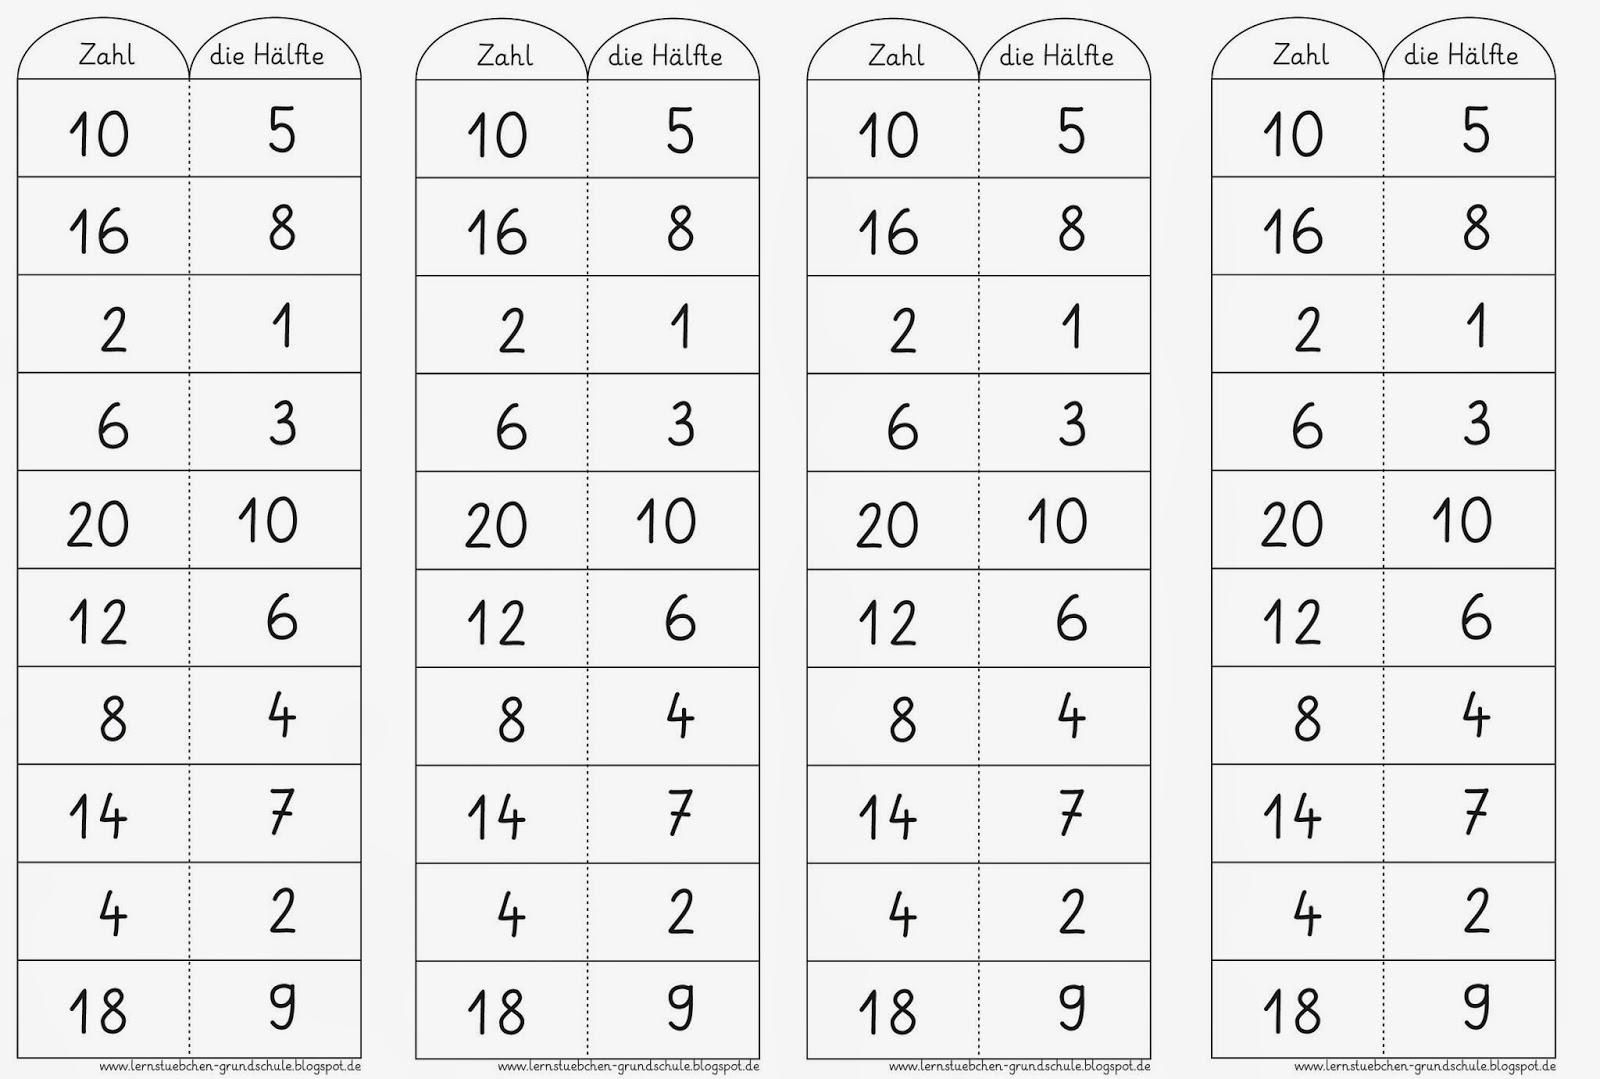 Mathe ubung klasse